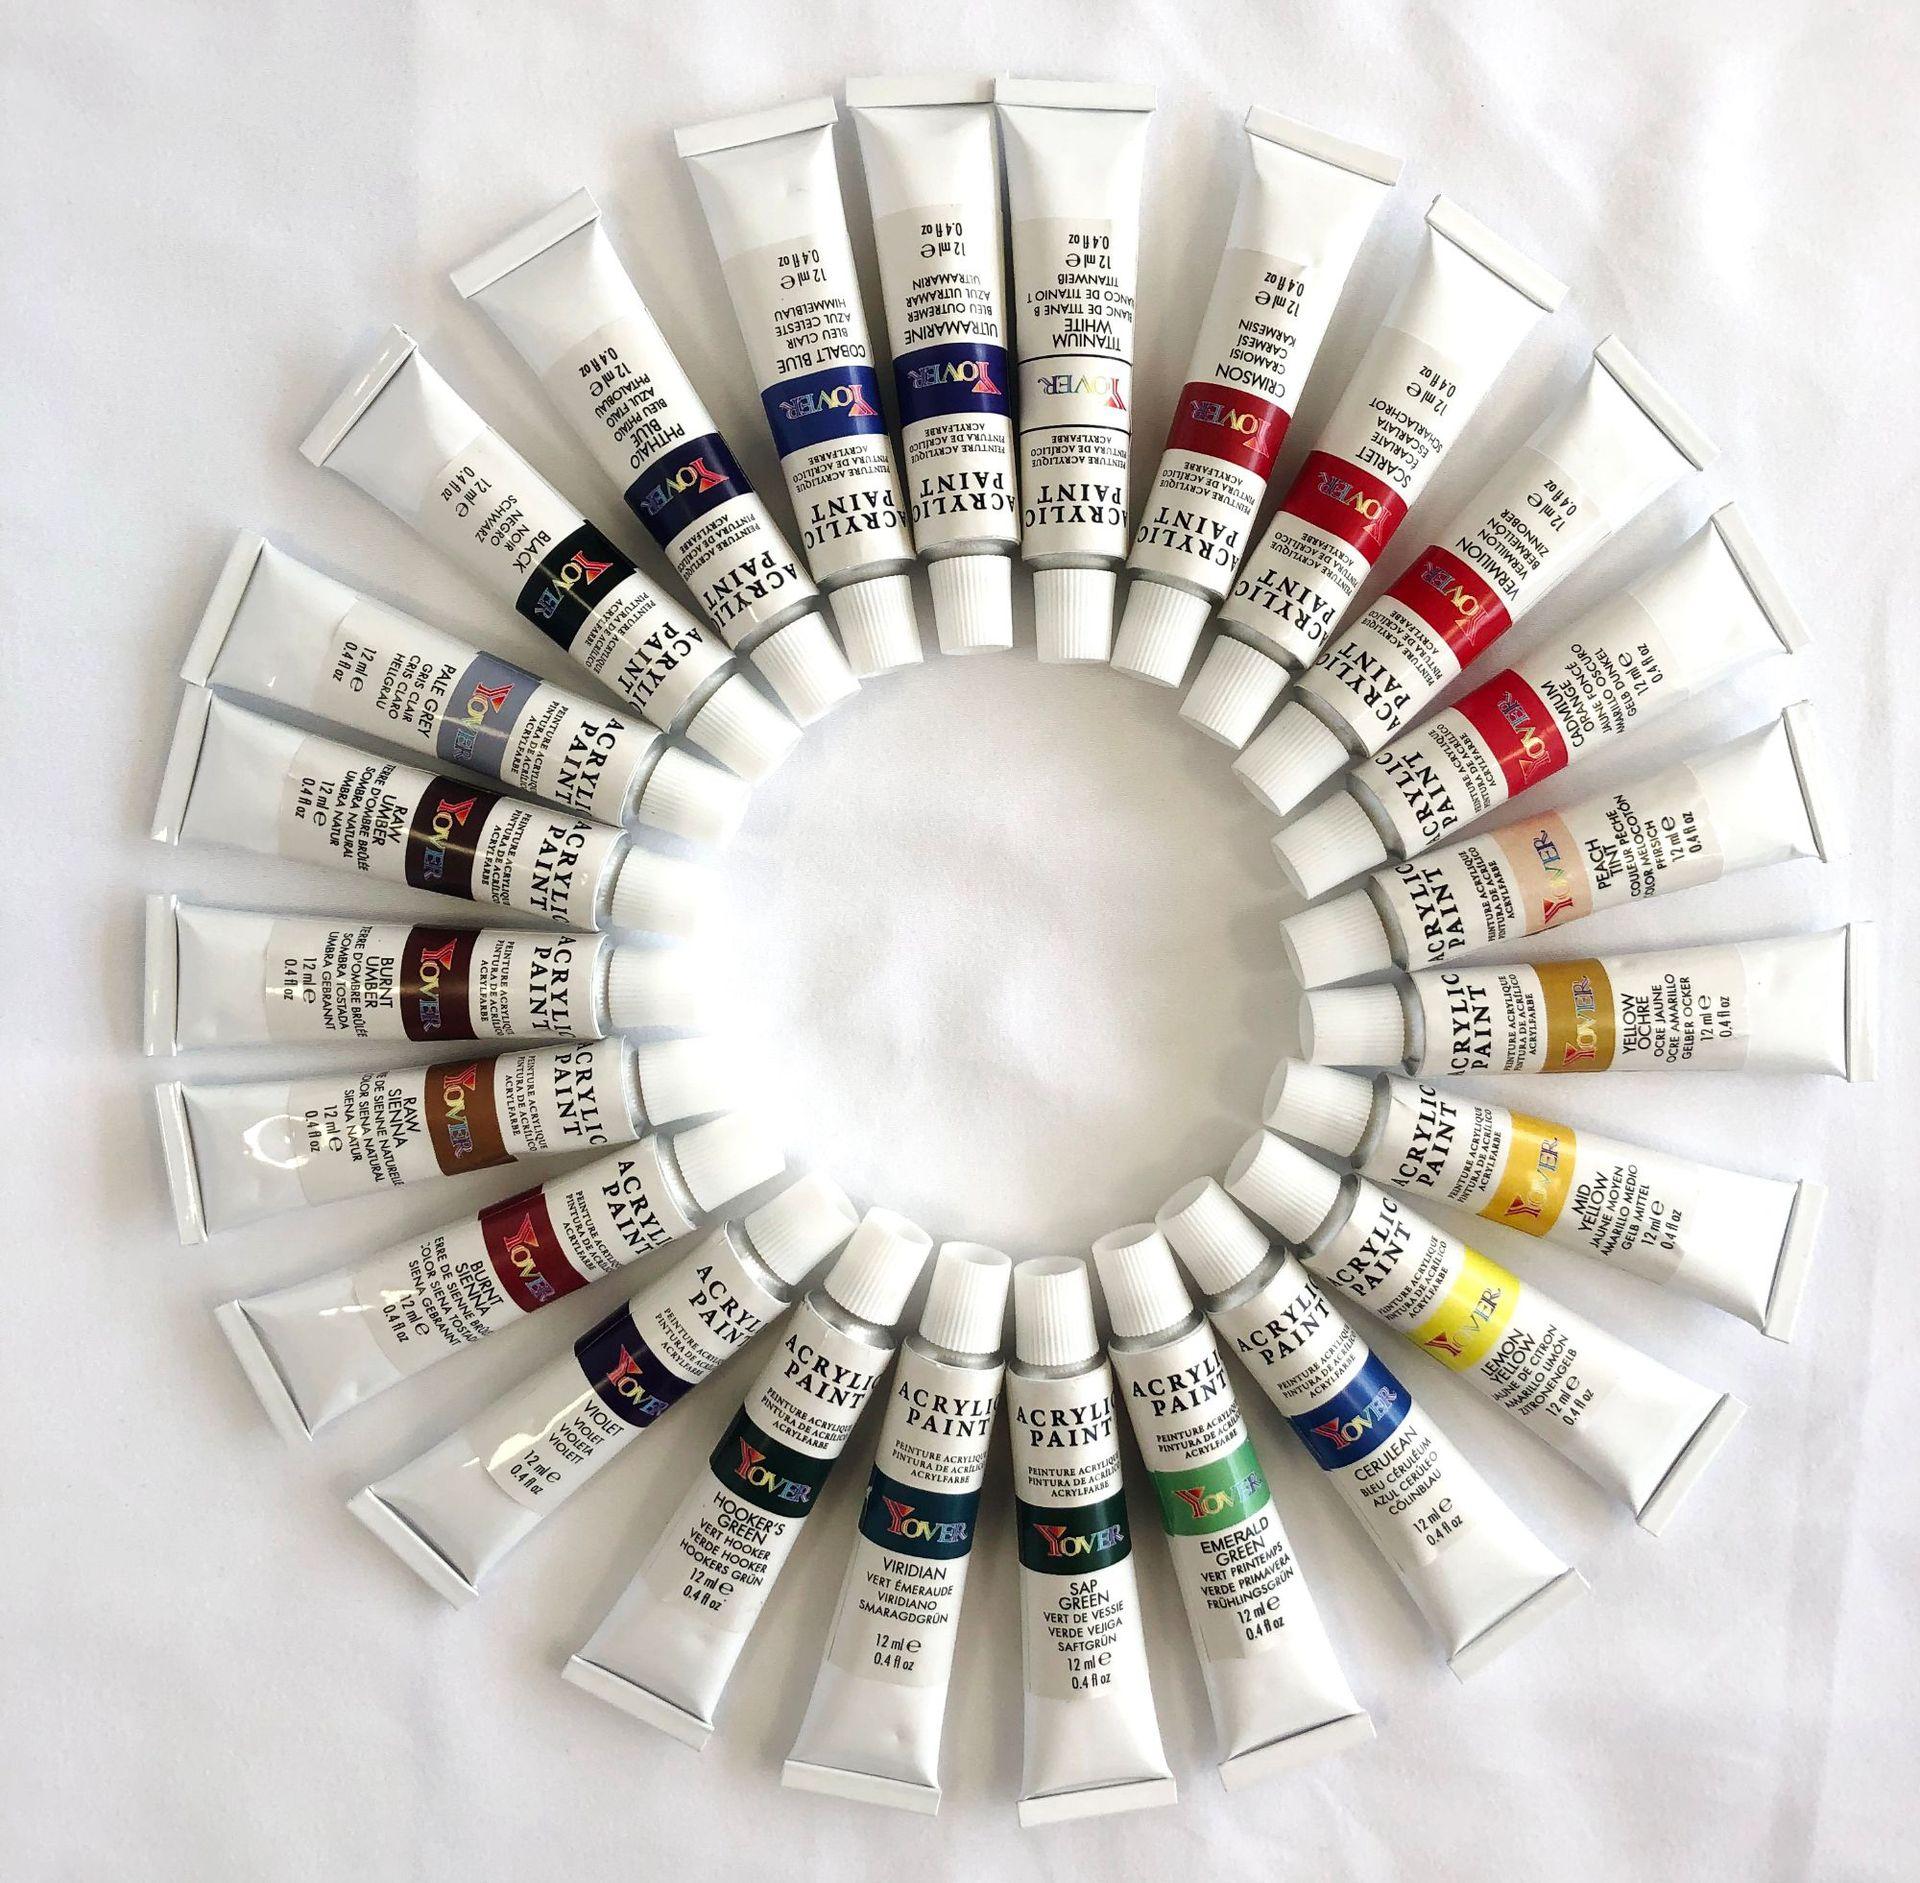 24 Pcs Acrylic Pigment Professional Art Sets Painting Supplies Art Pigment 24 Color 12ml Acrylic Pigment + 3 Brushes Set enlarge